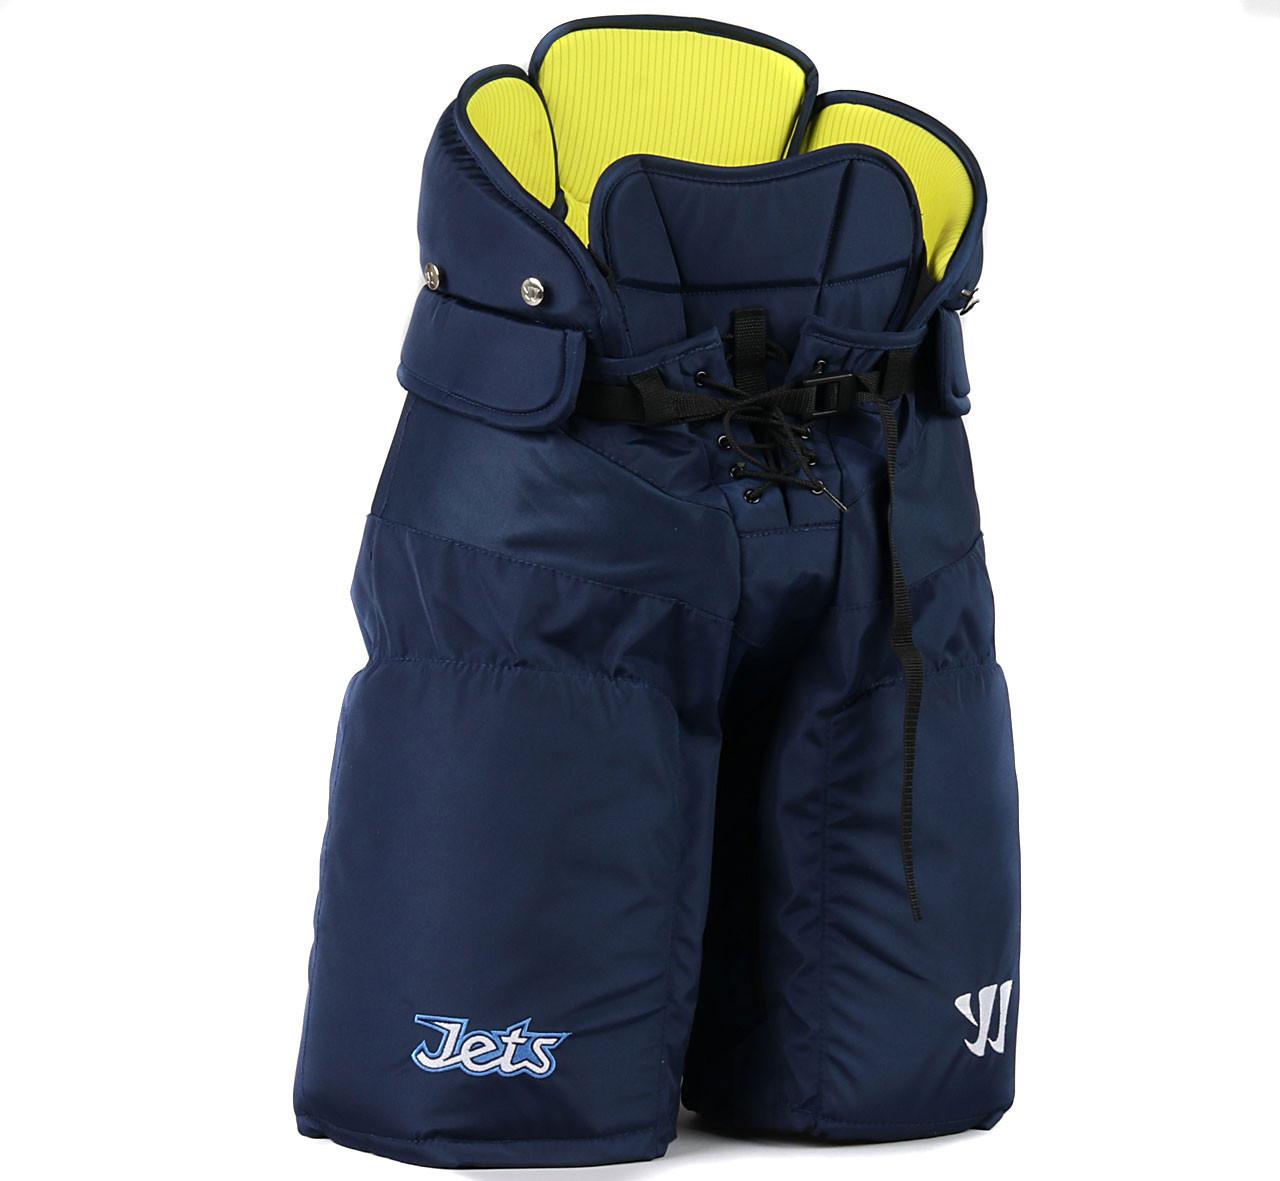 22431a5e676 Size M - Warrior Franchise Pants - Team Stock Winnipeg Jets - Pro ...